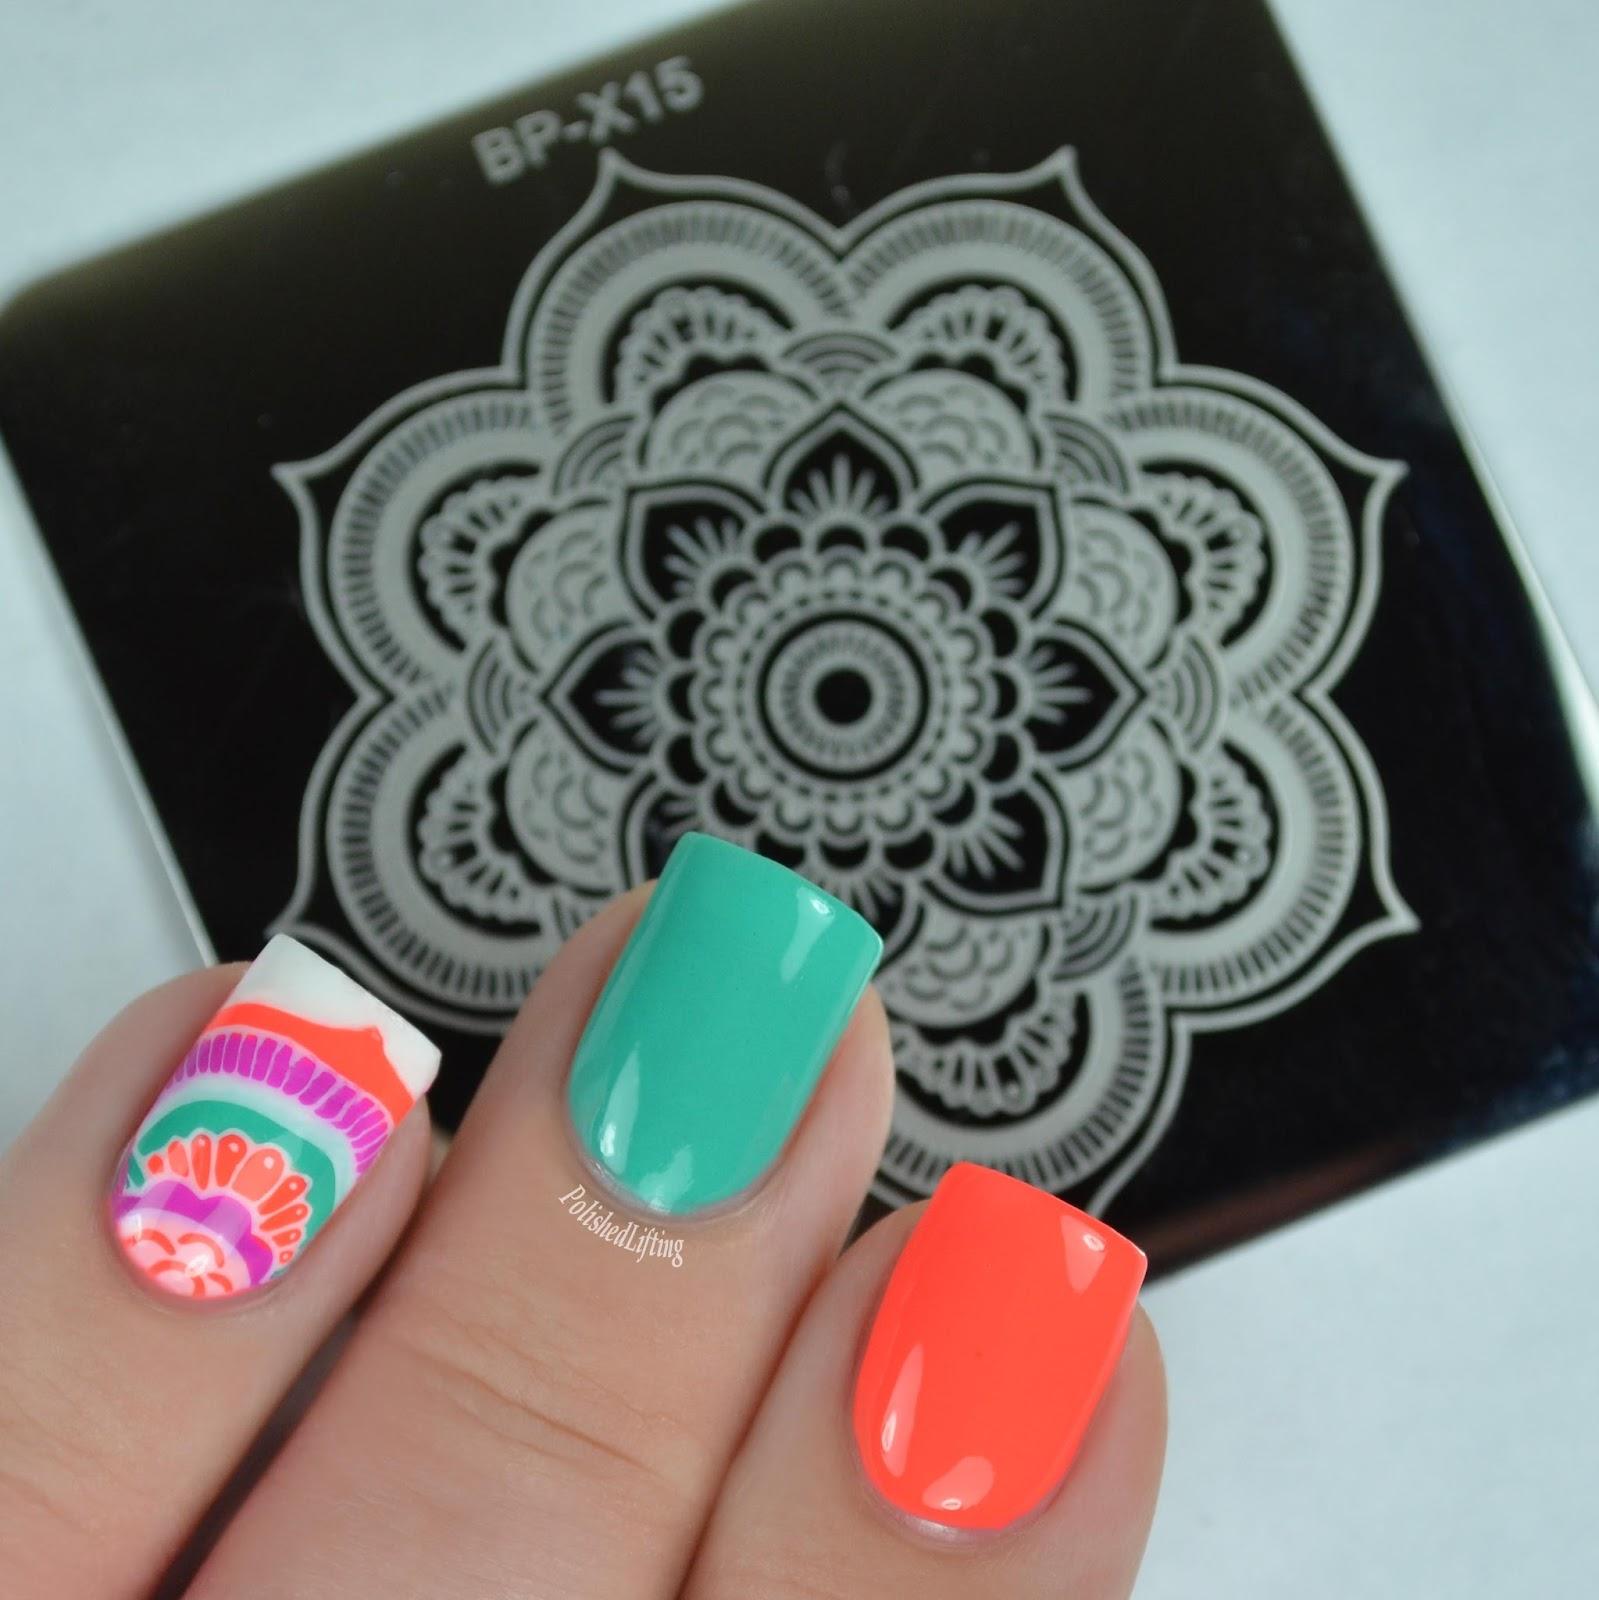 Polished Lifting: Born Pretty Mandala Nail Art Featuring Bliss Polish